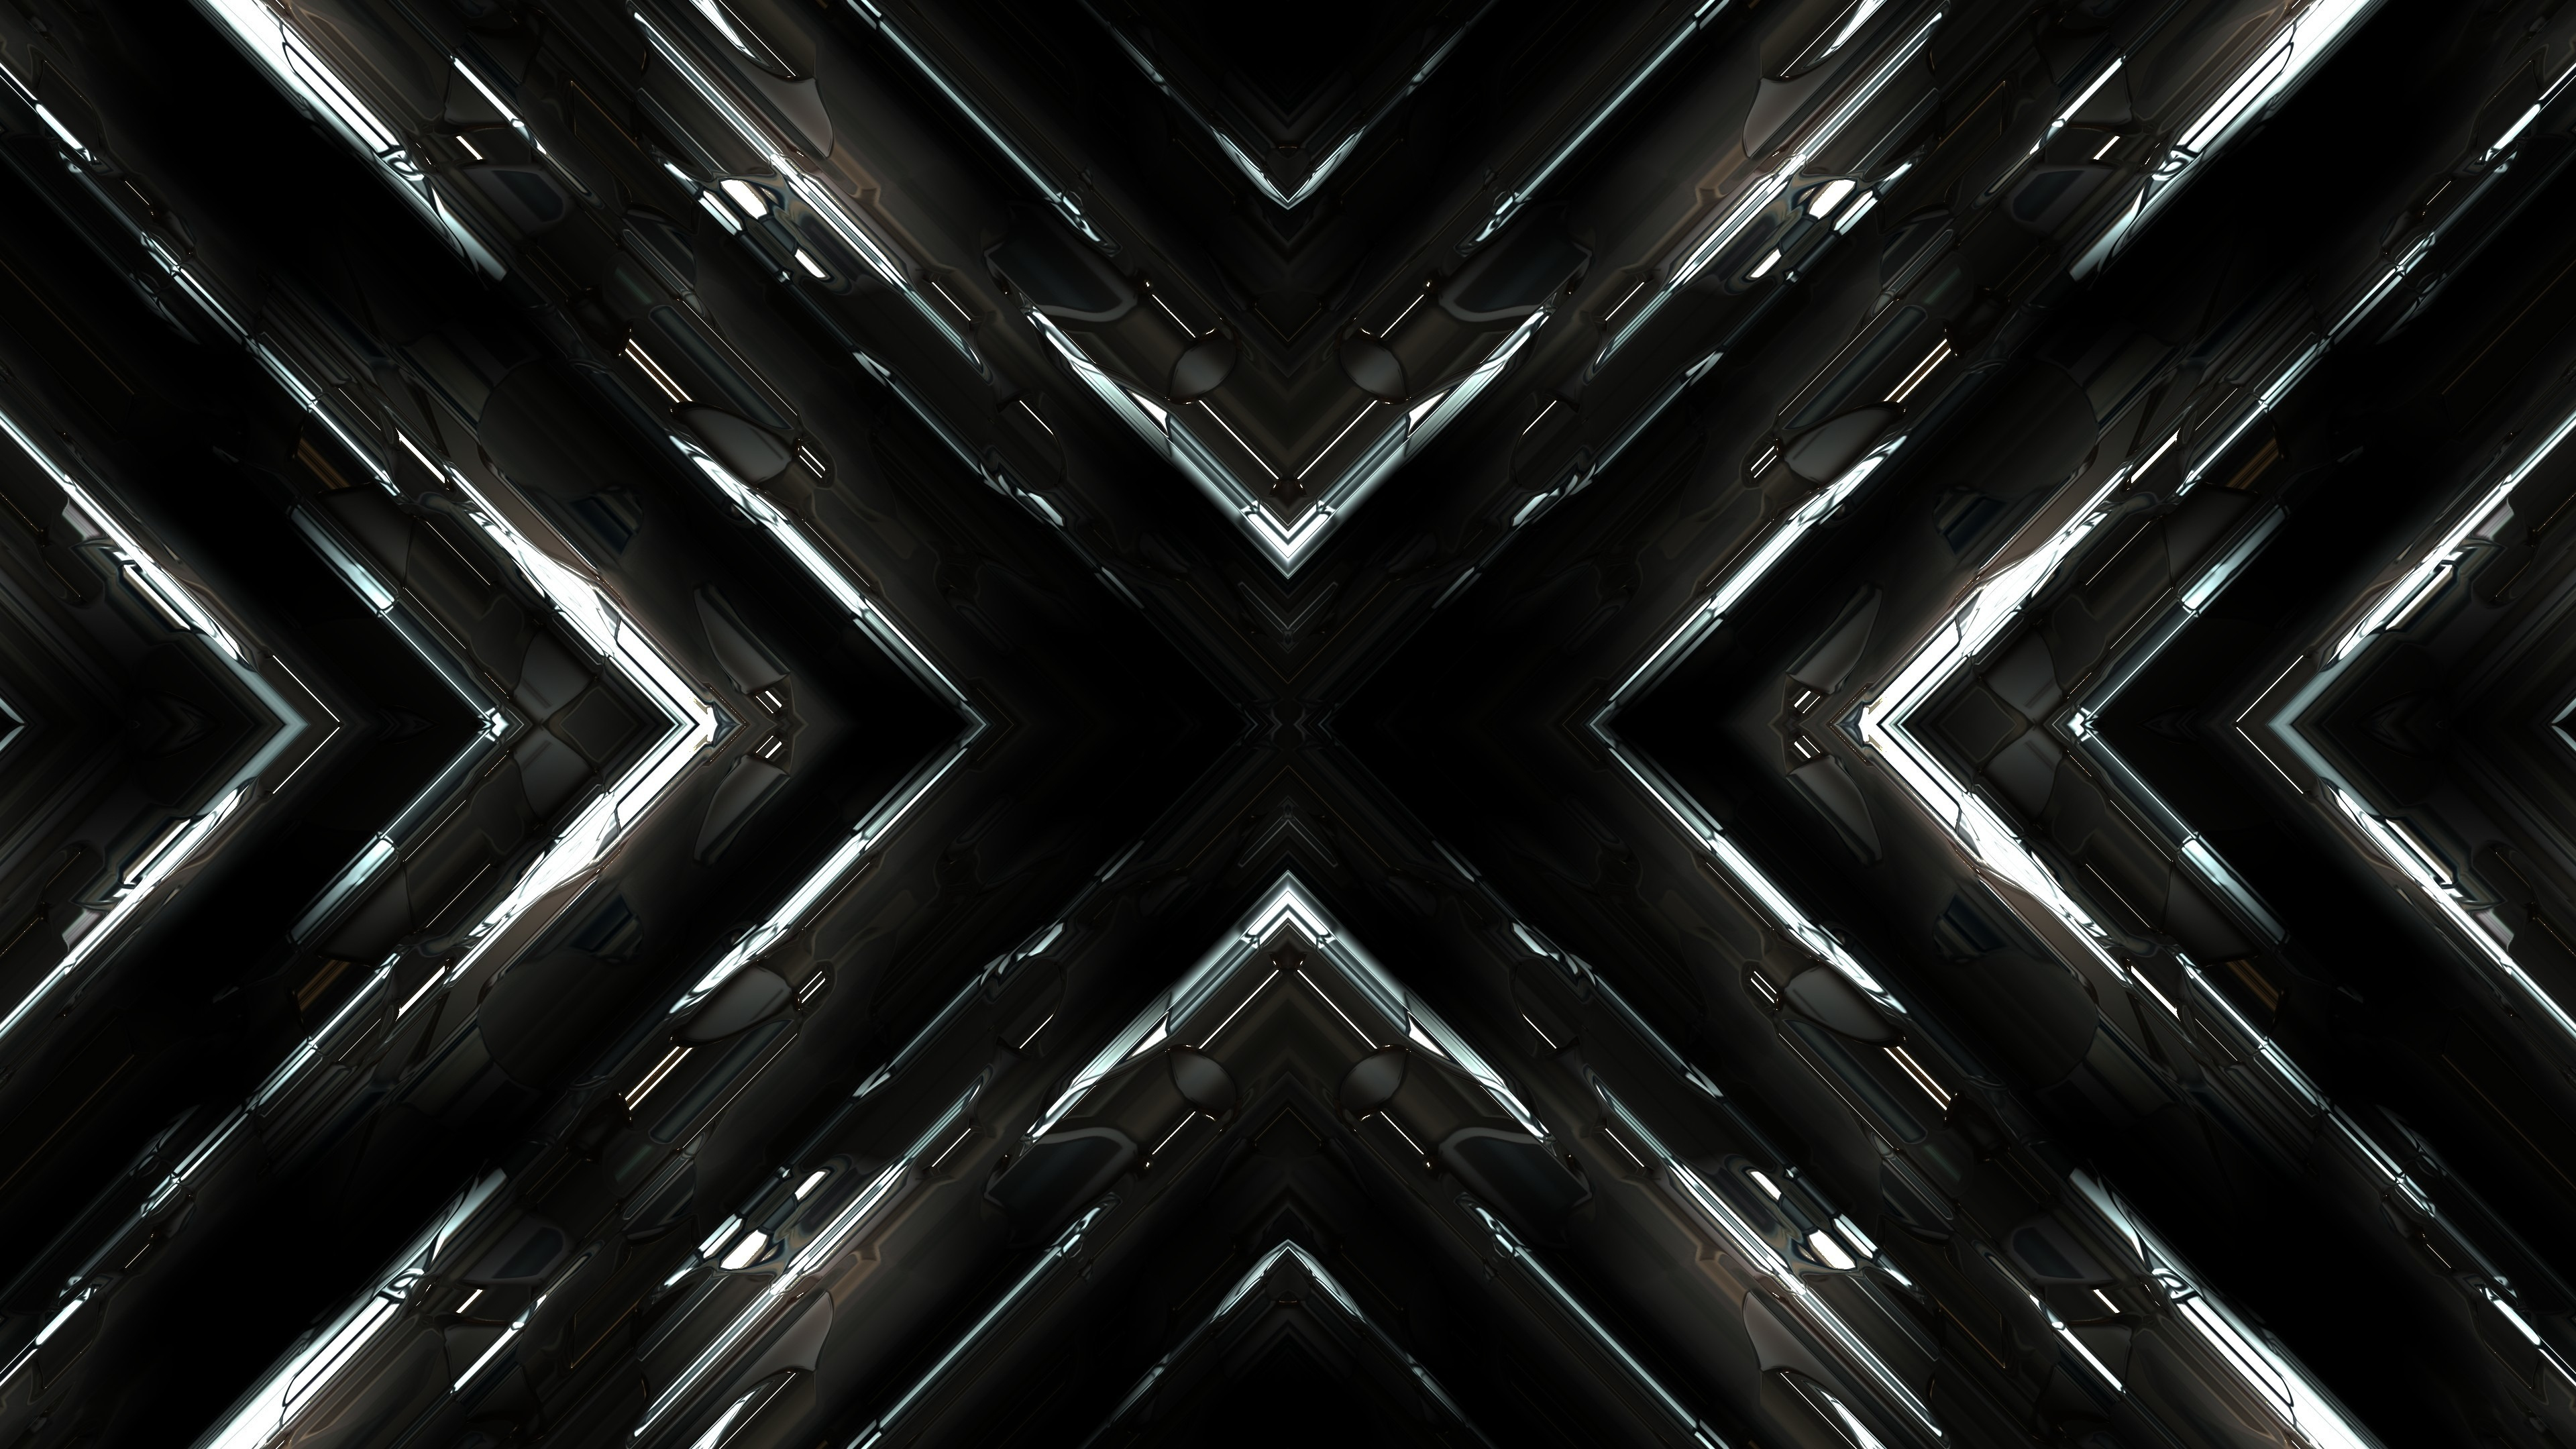 Download 3840x2400 Wallpaper Fractal Dark Abstract 4k Ultra Hd 16 10 Widescreen 3840x2400 Hd Image Background 1872